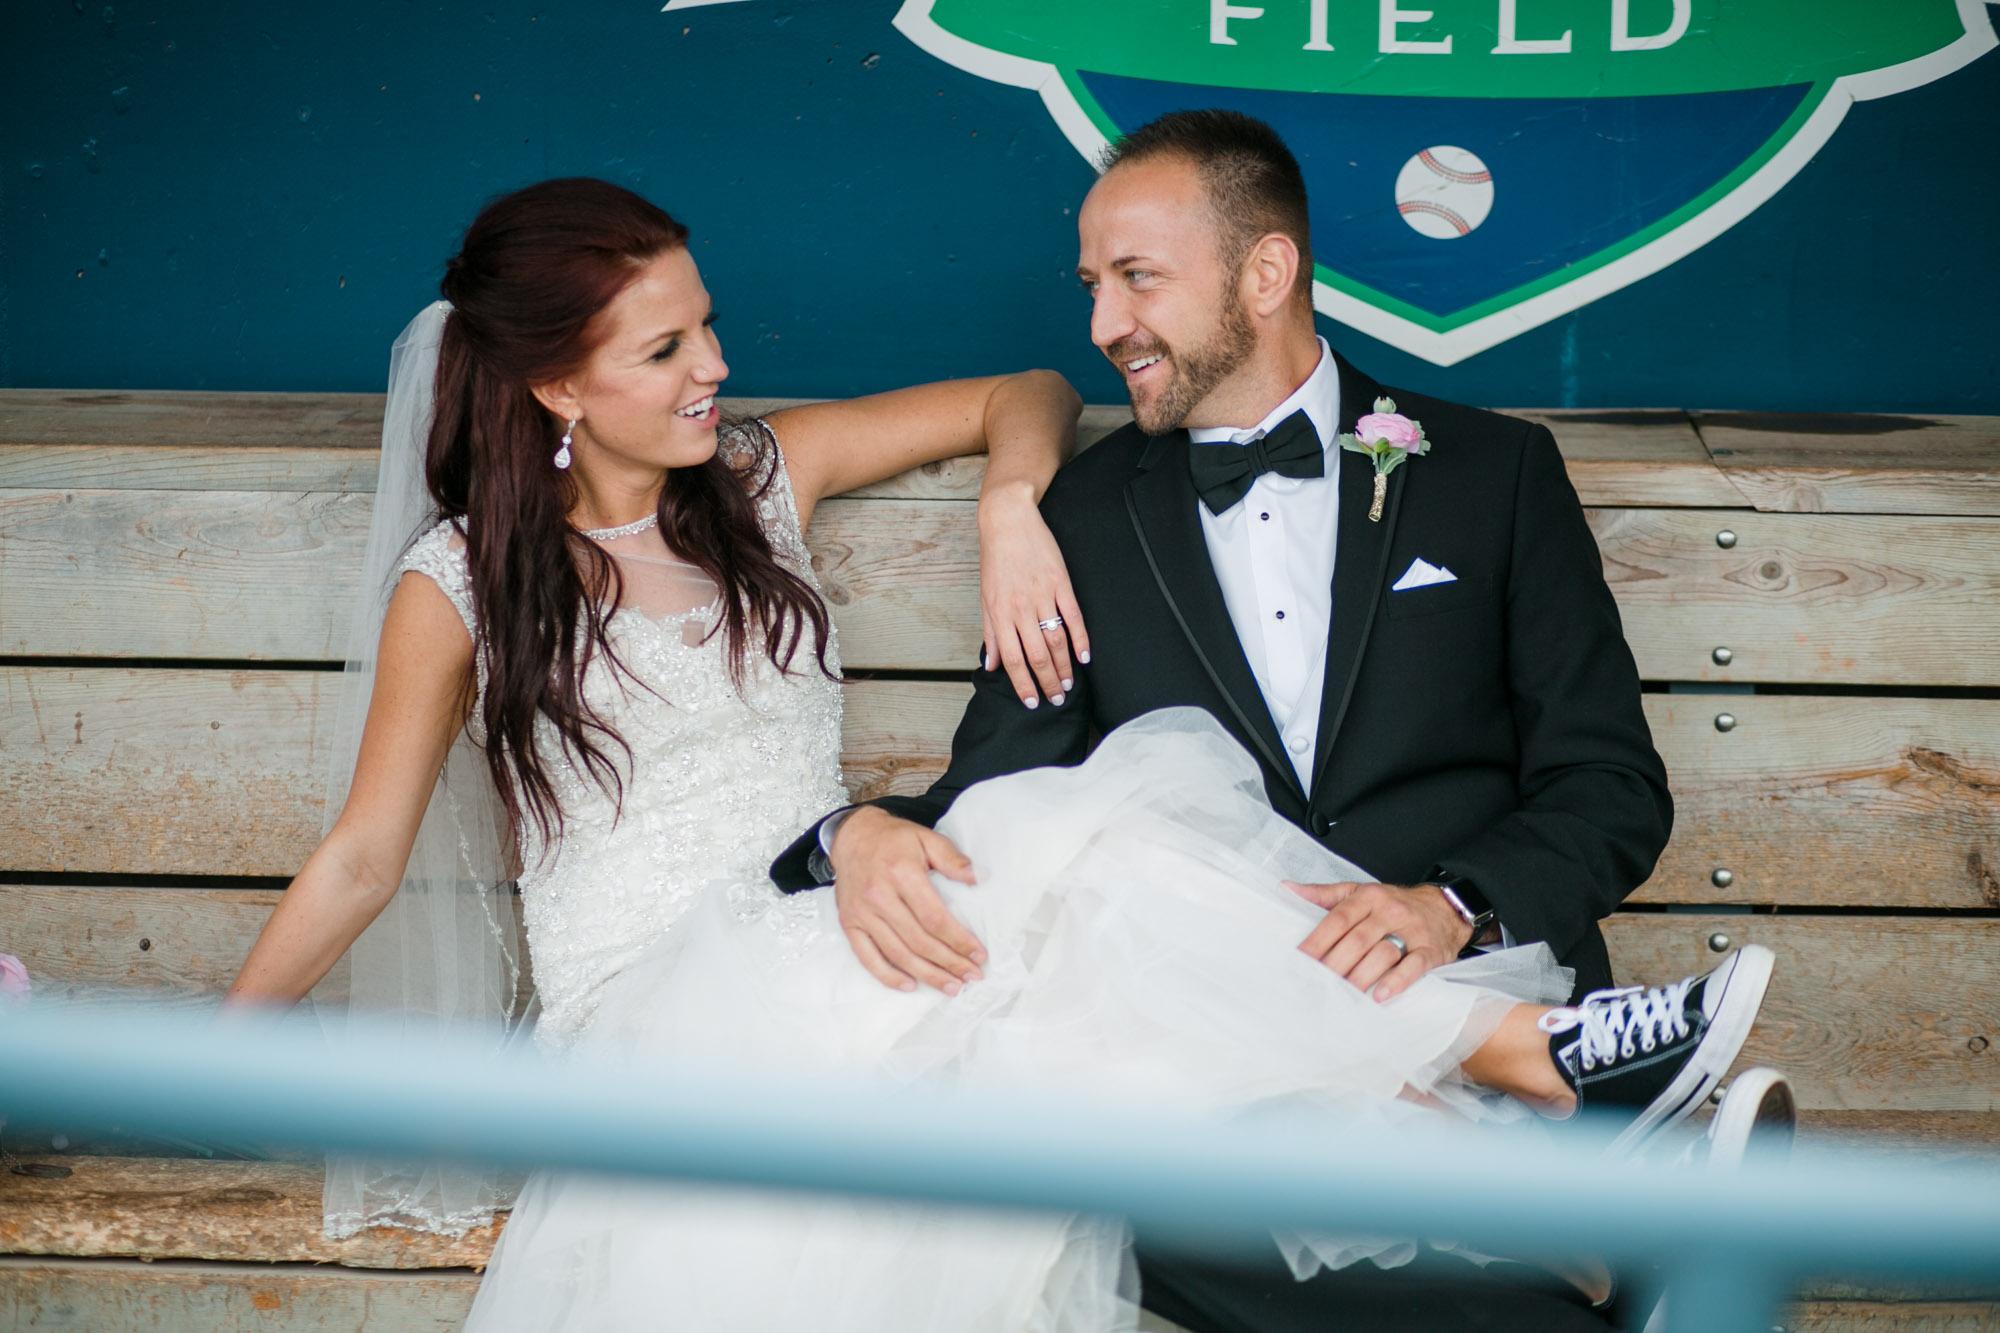 hensville-wedding-downtown-toledo-ohio (83 of 103).jpg